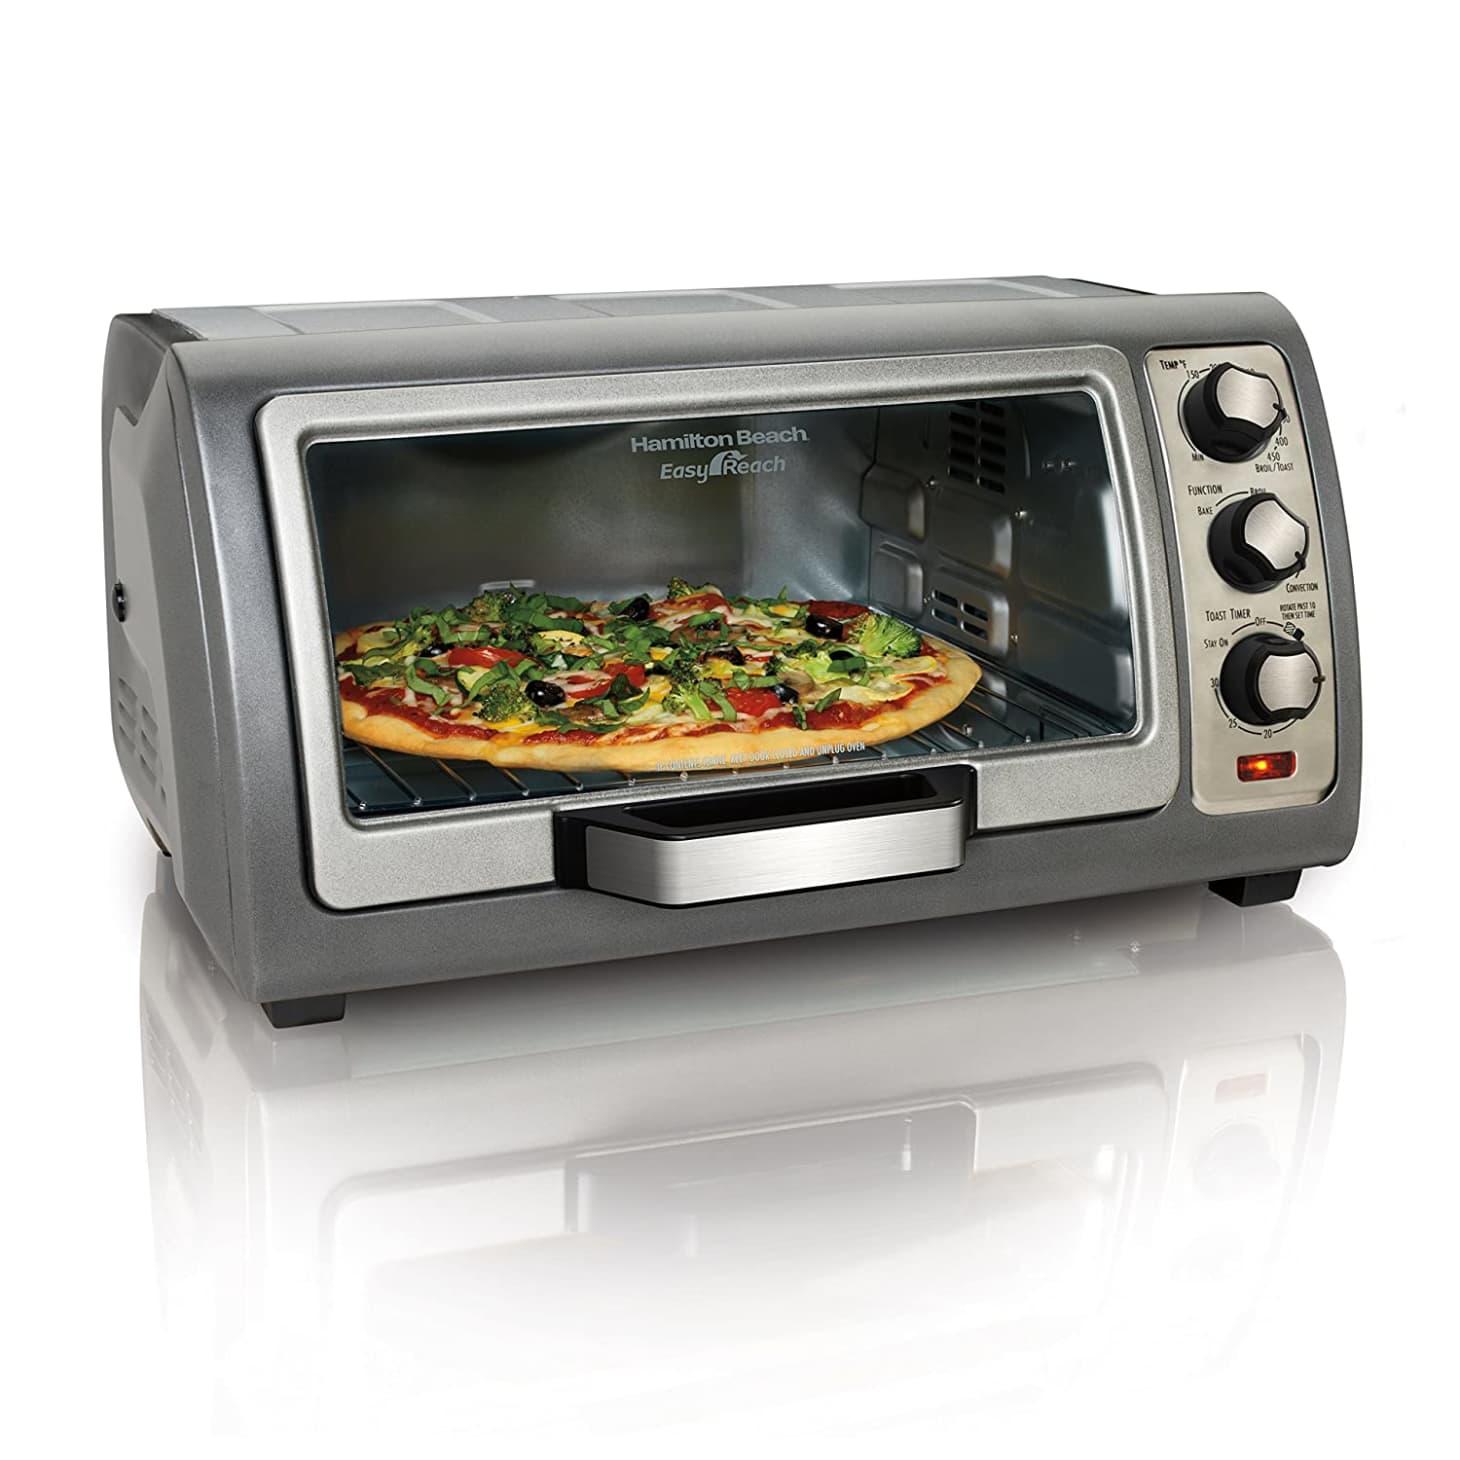 Small Mini Toaster Oven Decoration Jacques Garcia